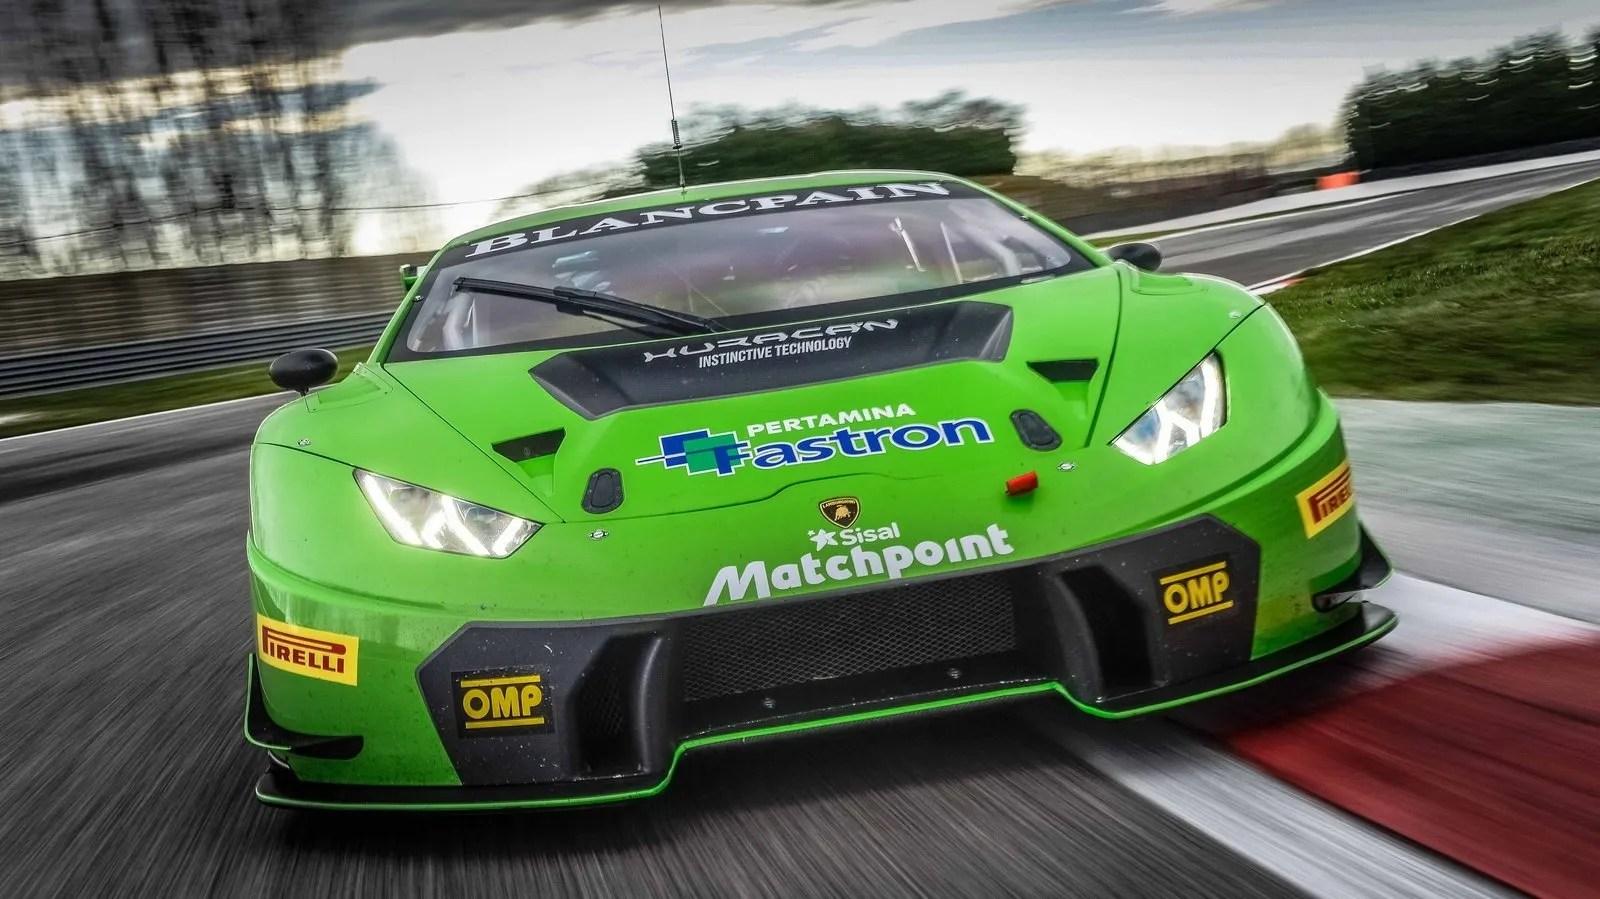 Lamborghini Aventador Cars Wallpapers Lamborghini Huracan Gt3 Will Make North American Gt3